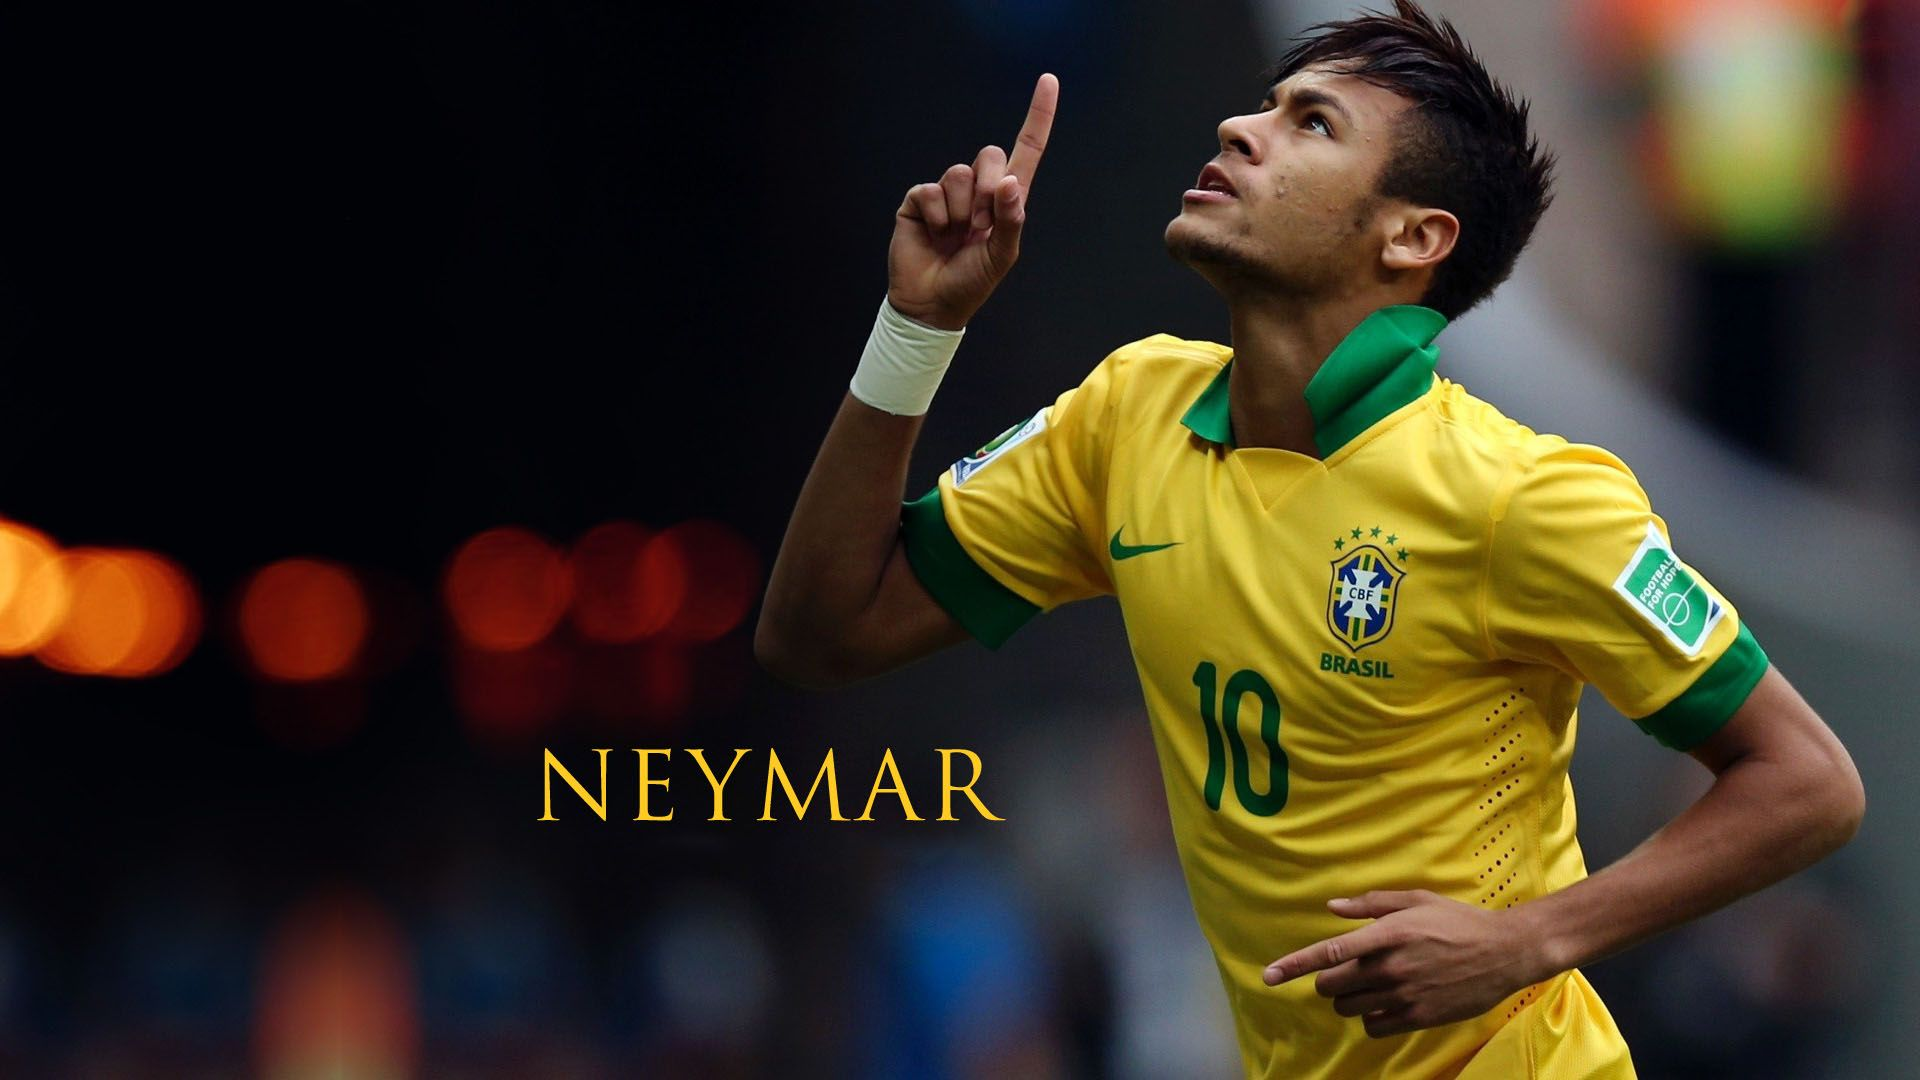 Best Neymar Jr Latest FIFA Images, HD Wallpapers, Desktop